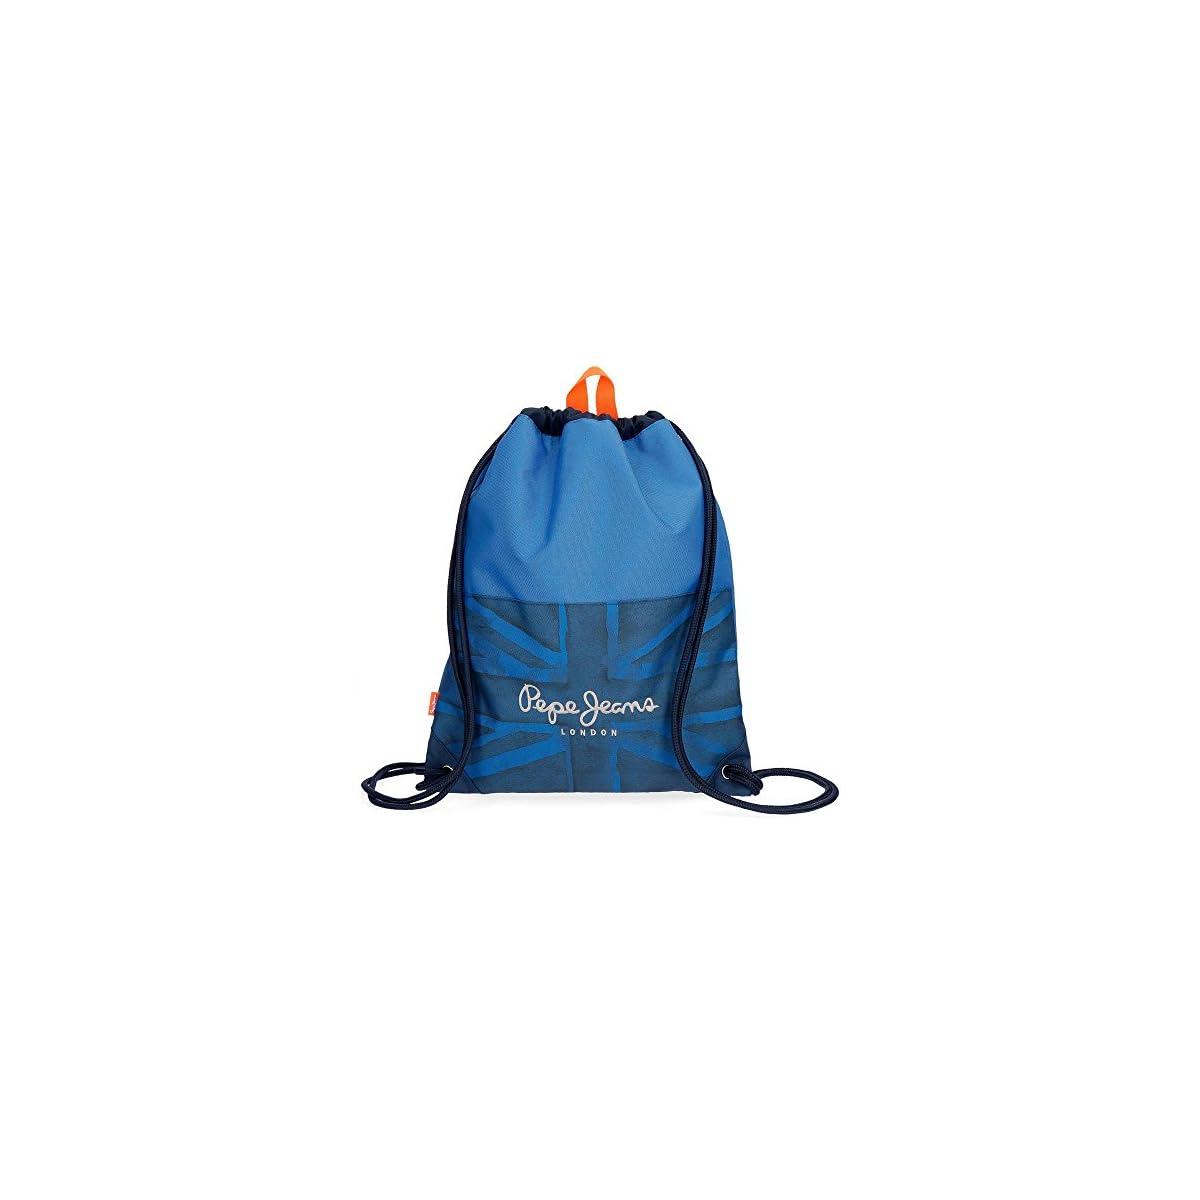 517cEDUgExL. SS1200  - Pepe Jeans Fabio Mochila Tipo Casual, 44 cm, 0.77 litros, Azul